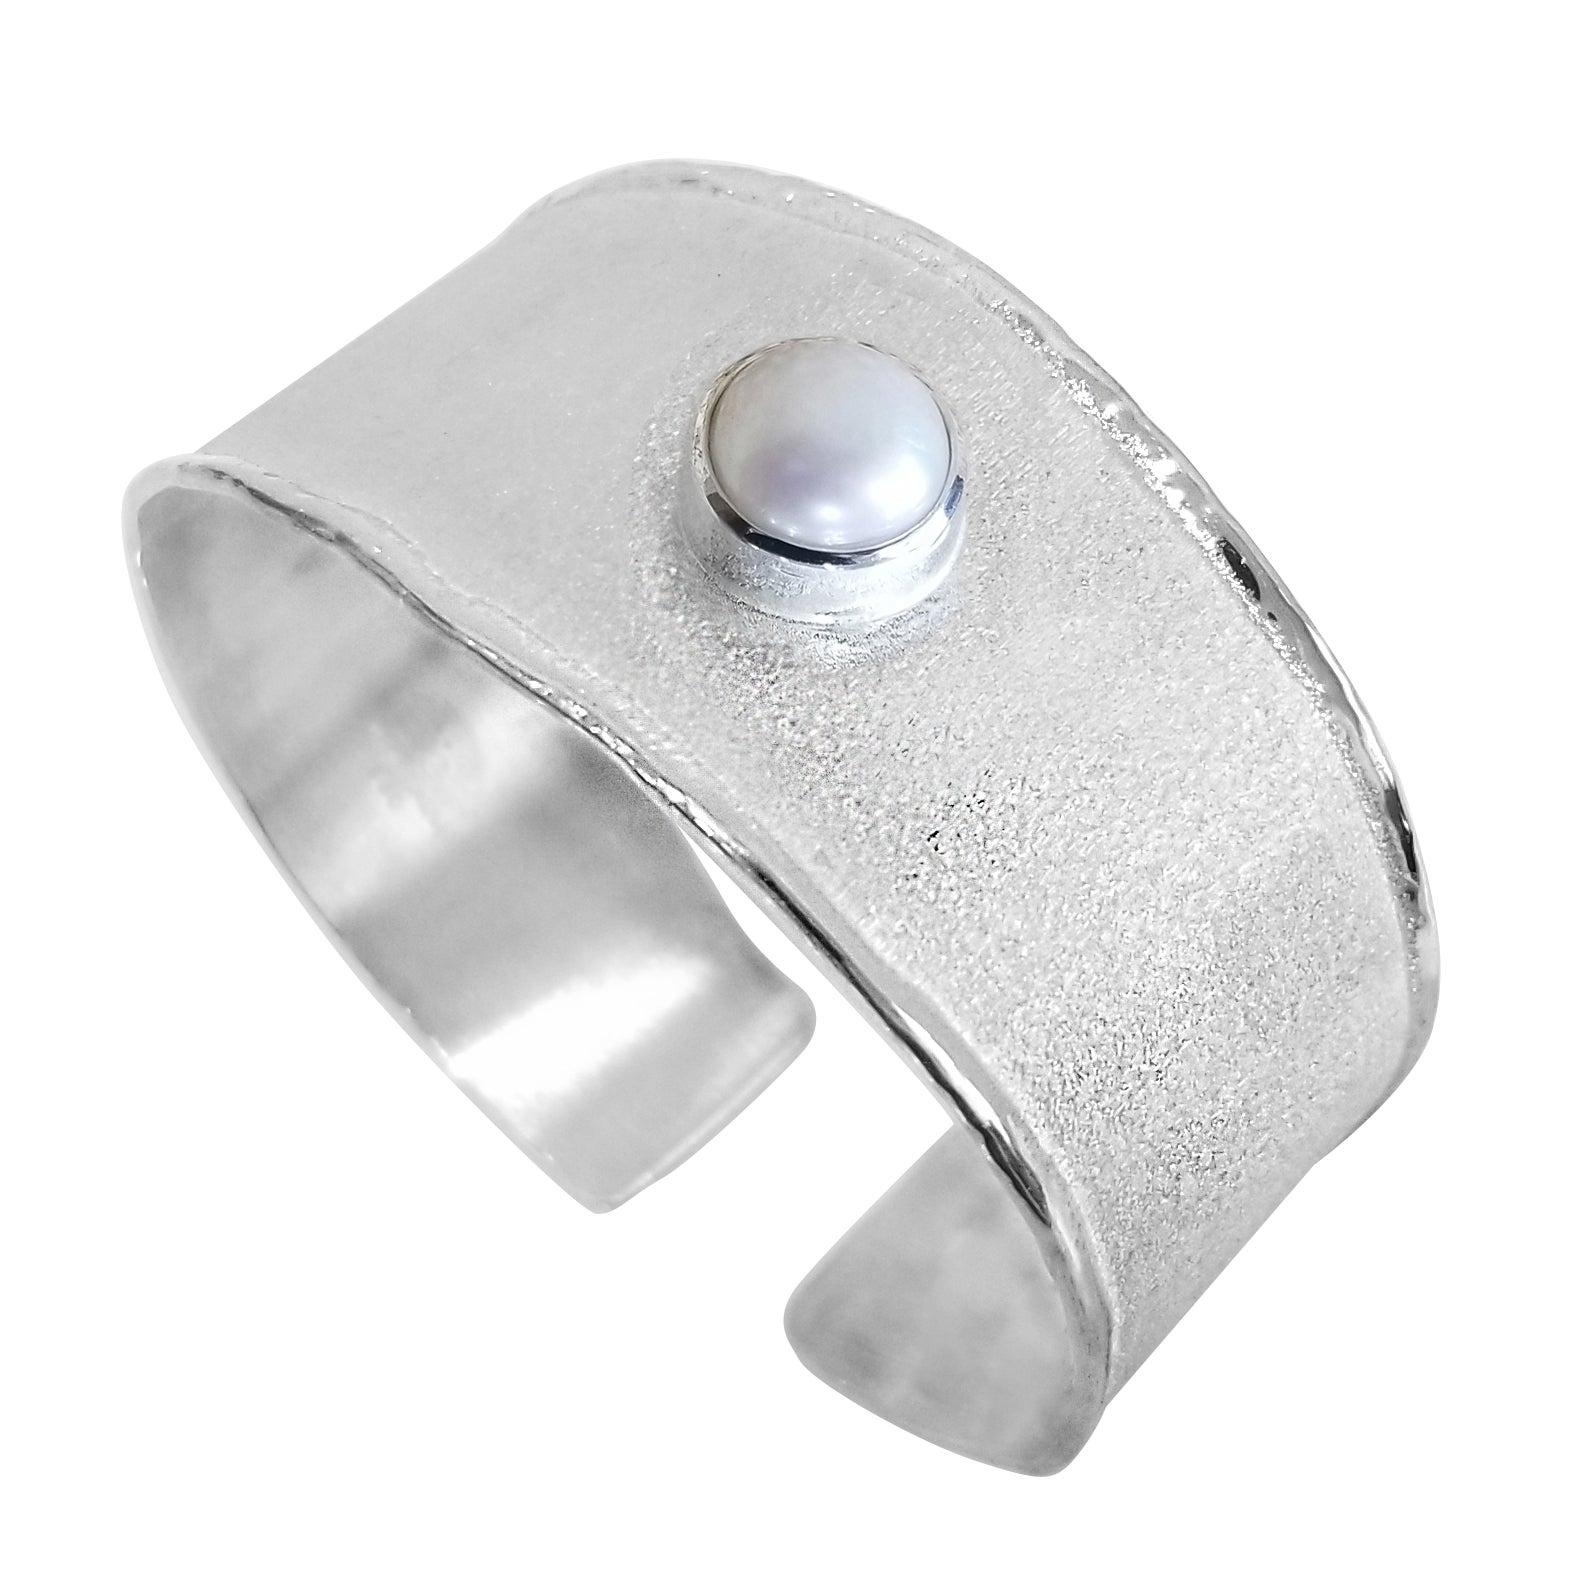 Yianni Creations Freshwater Pearl Fine Silver and Palladium Bangle Bracelet